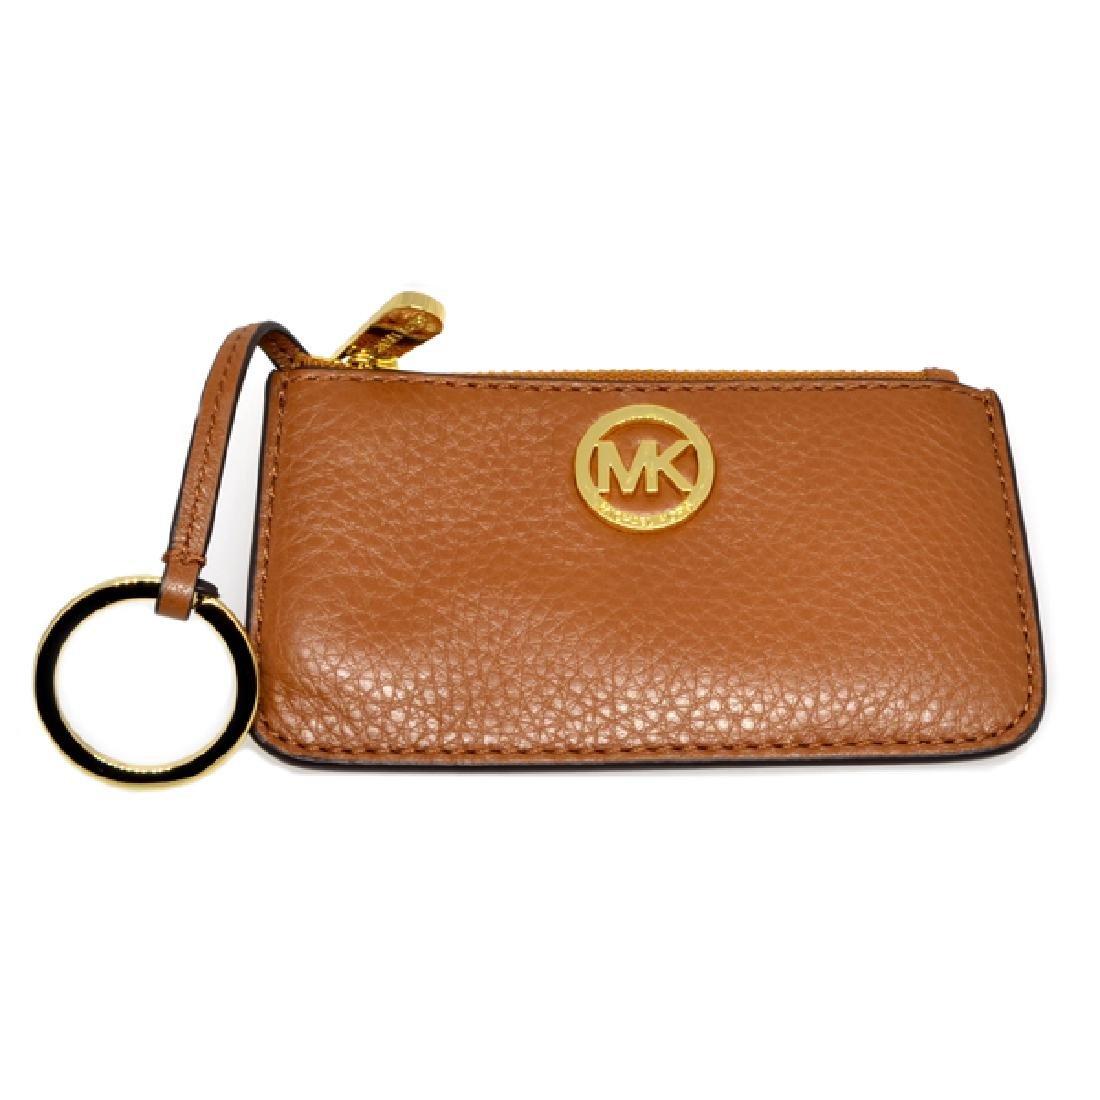 ^Brand New Michael Kors Fulton Luggage Leather Key